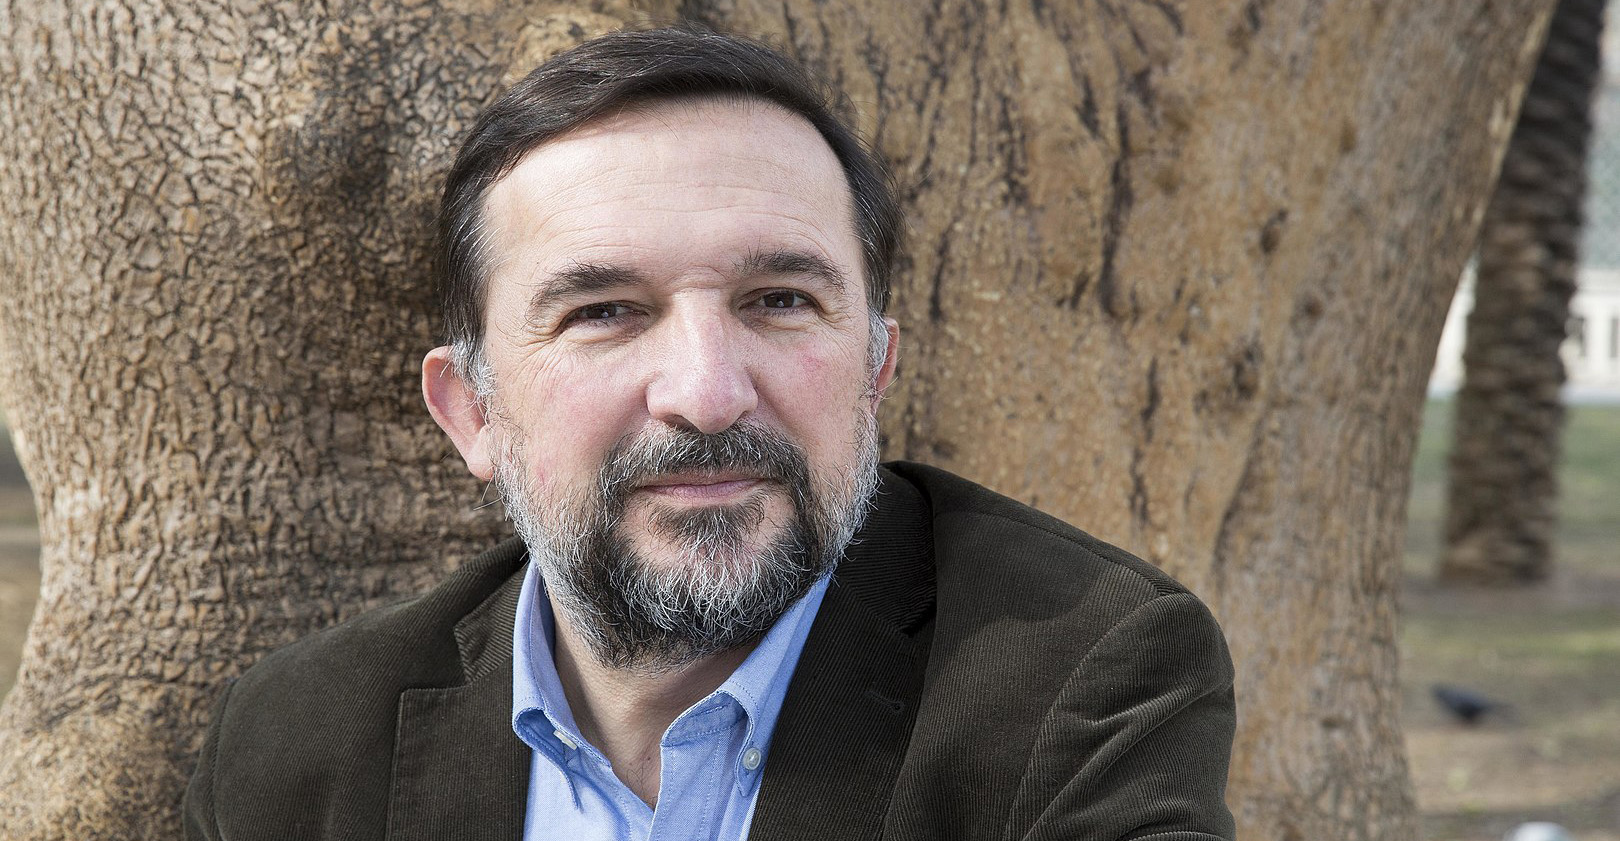 Sergio Vila-Sanjuán. De Medol - Trabajo propio, CC BY-SA 4.0, https://commons.wikimedia.org/w/index.php?curid=49026833